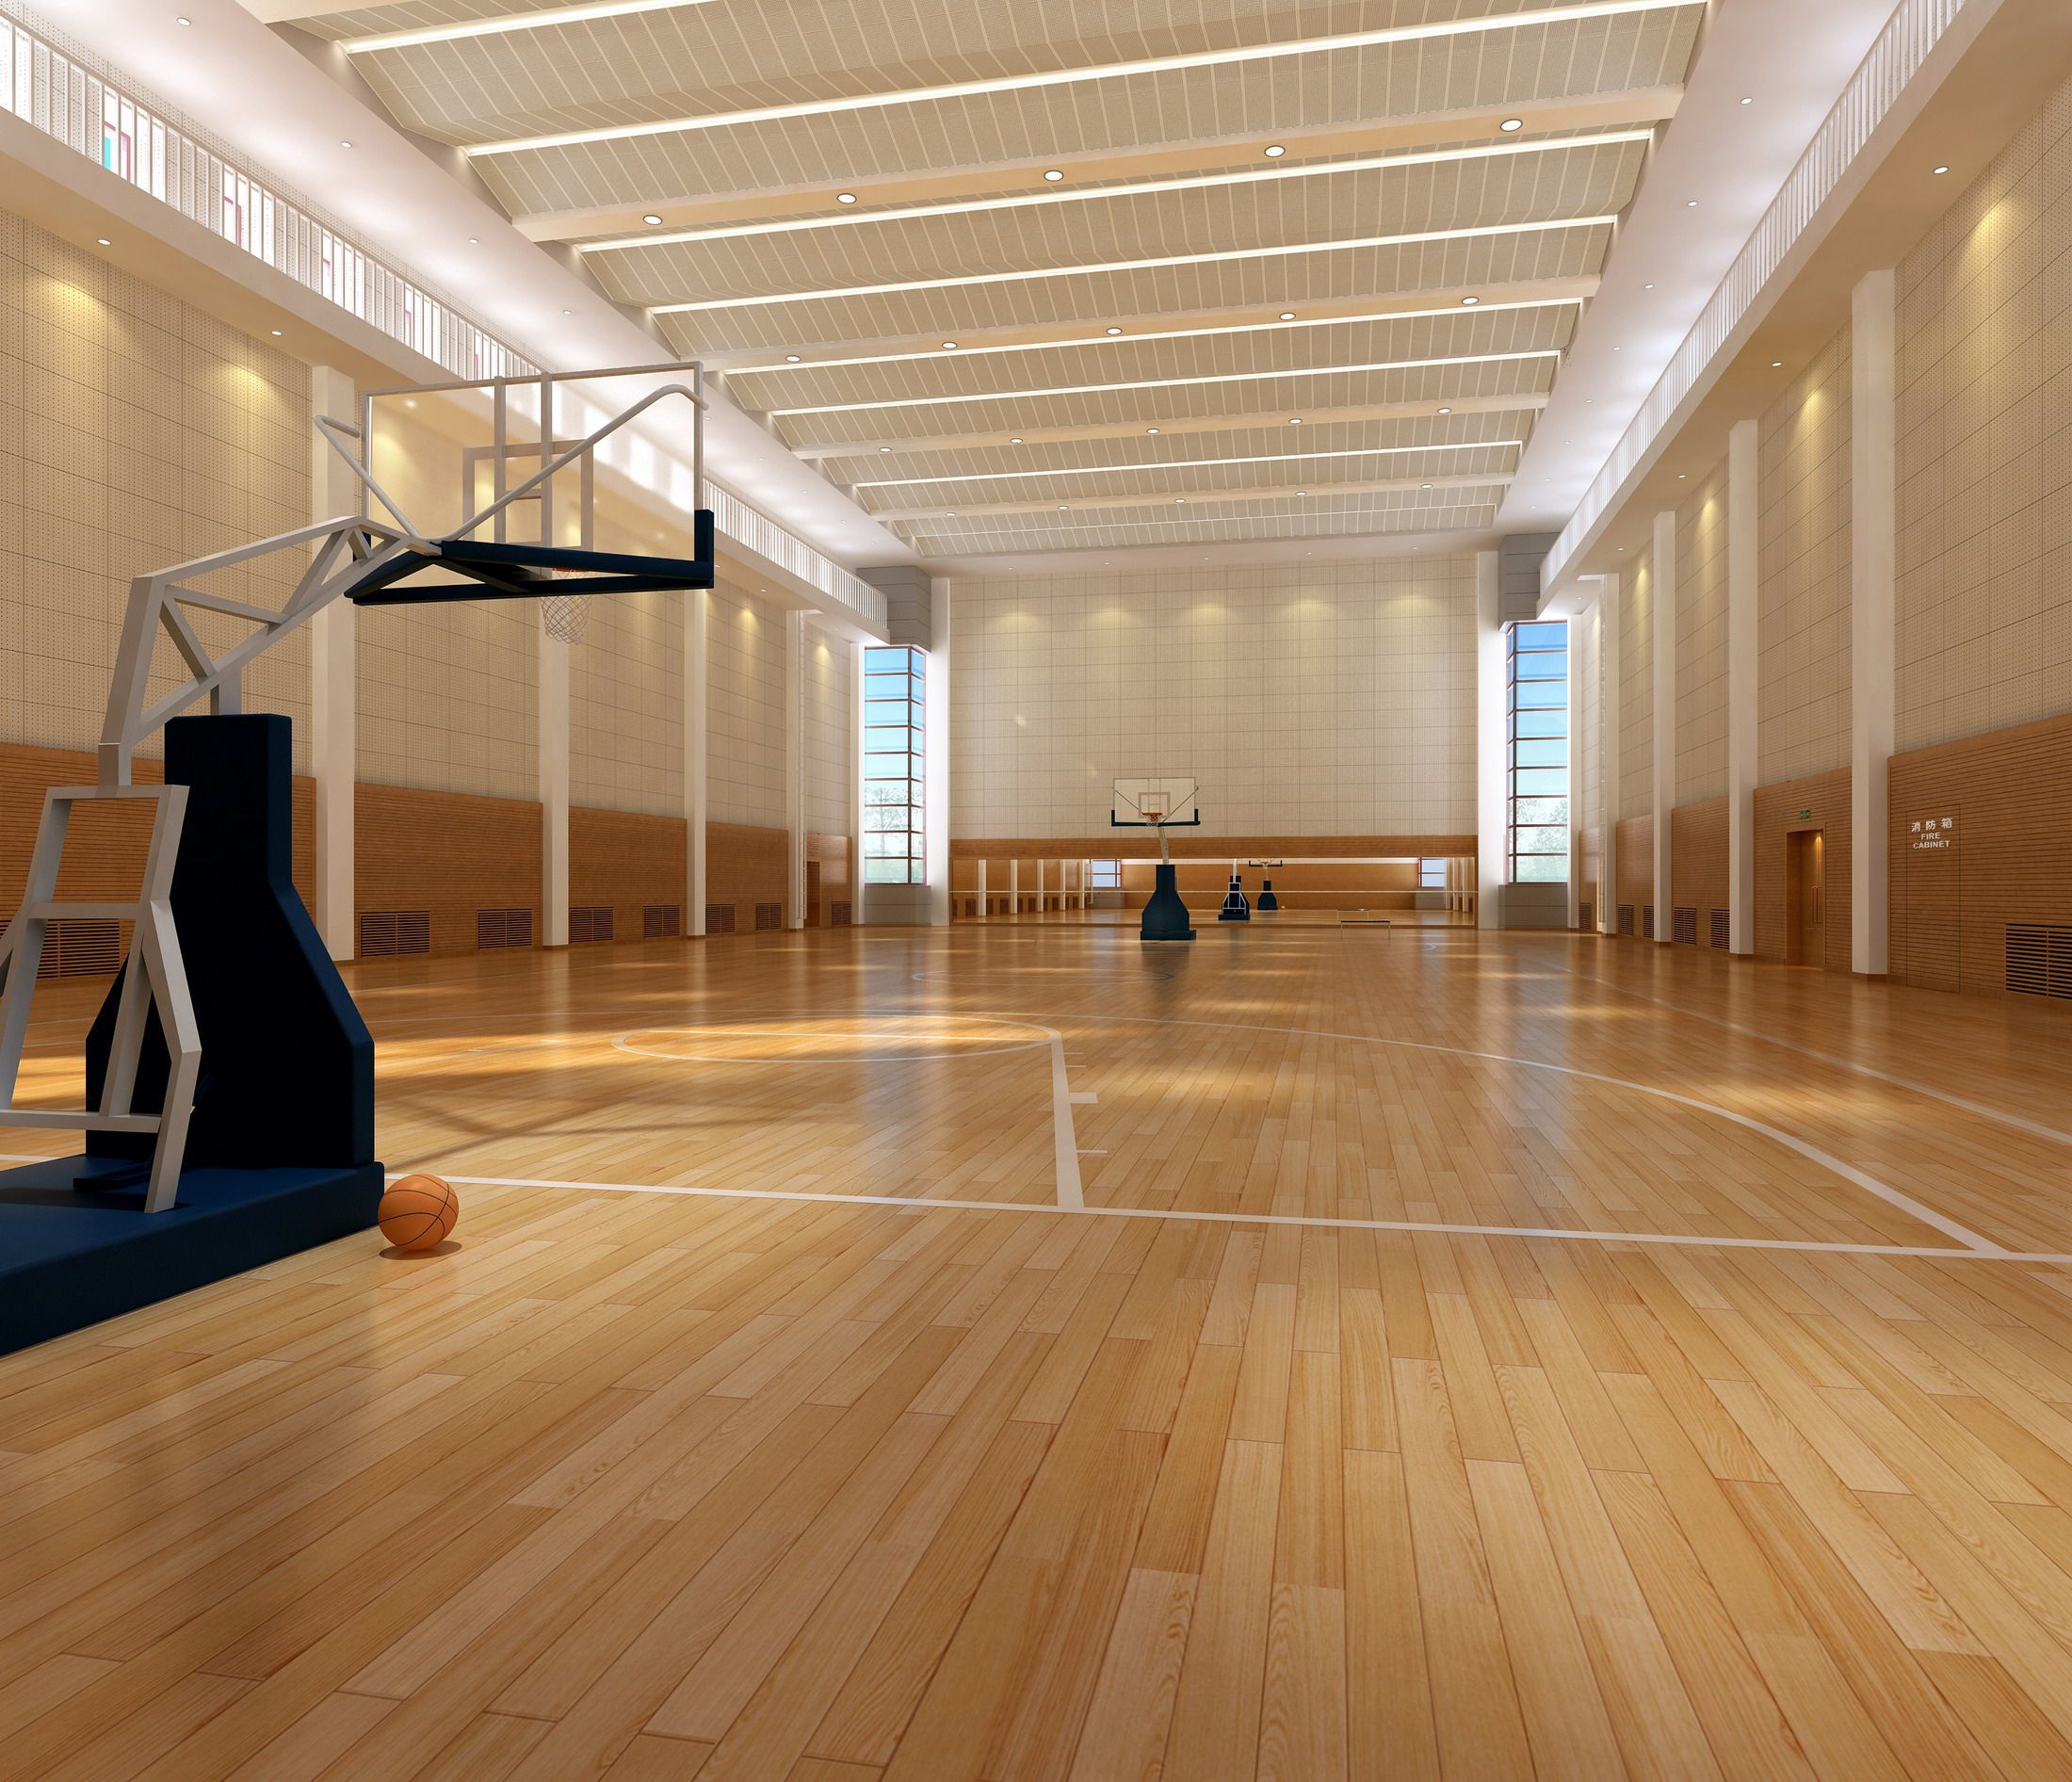 Basketball Gymnasium Arena 002 3d Model Detailed Basket Ball Arena Vray 1 5 Sence 3d Model Gymnasium Sports 3d Models Basketball Tricks Basketball 3 D